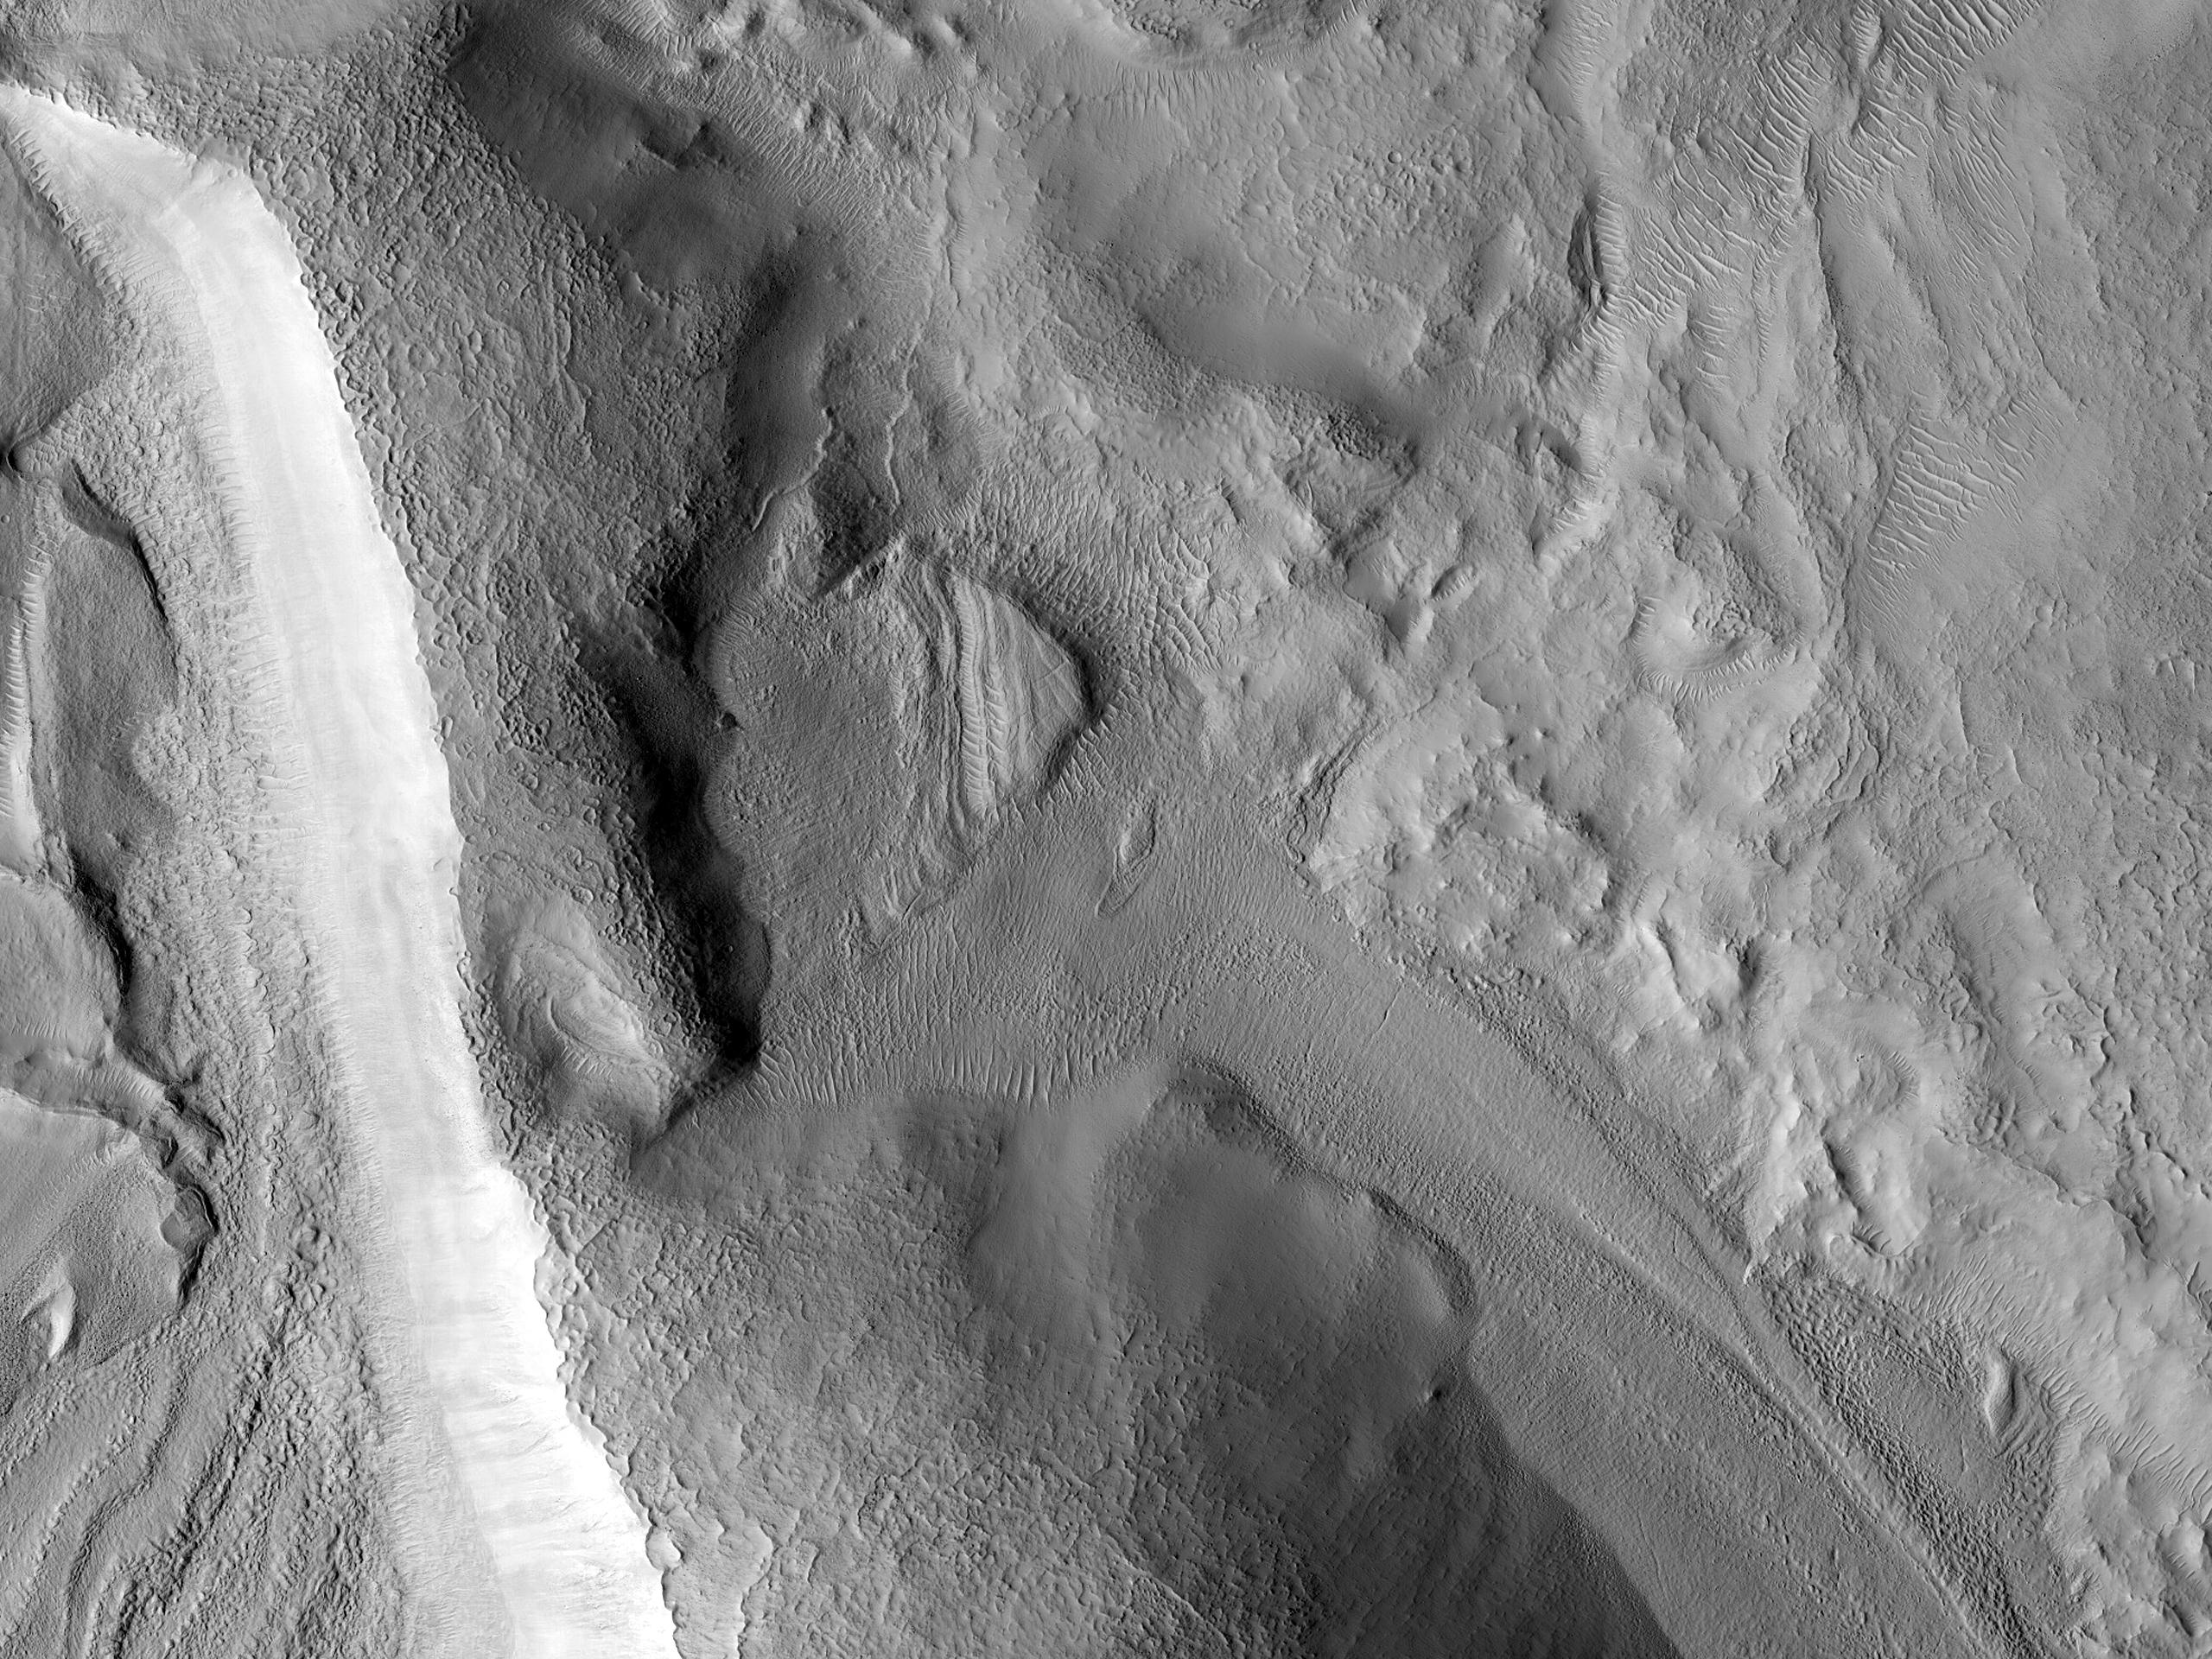 Flow Moving through Crater in Nilosyrtis Mensae